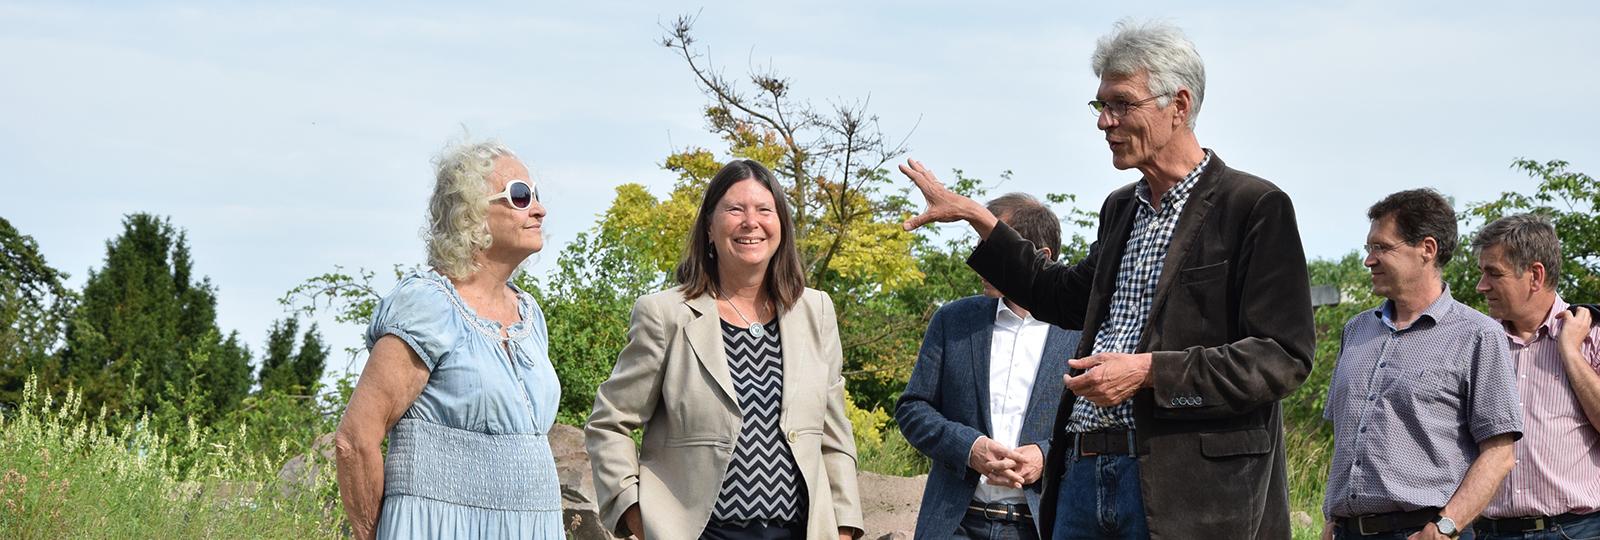 Umweltministerin Ulrike Höfken im Gespräch